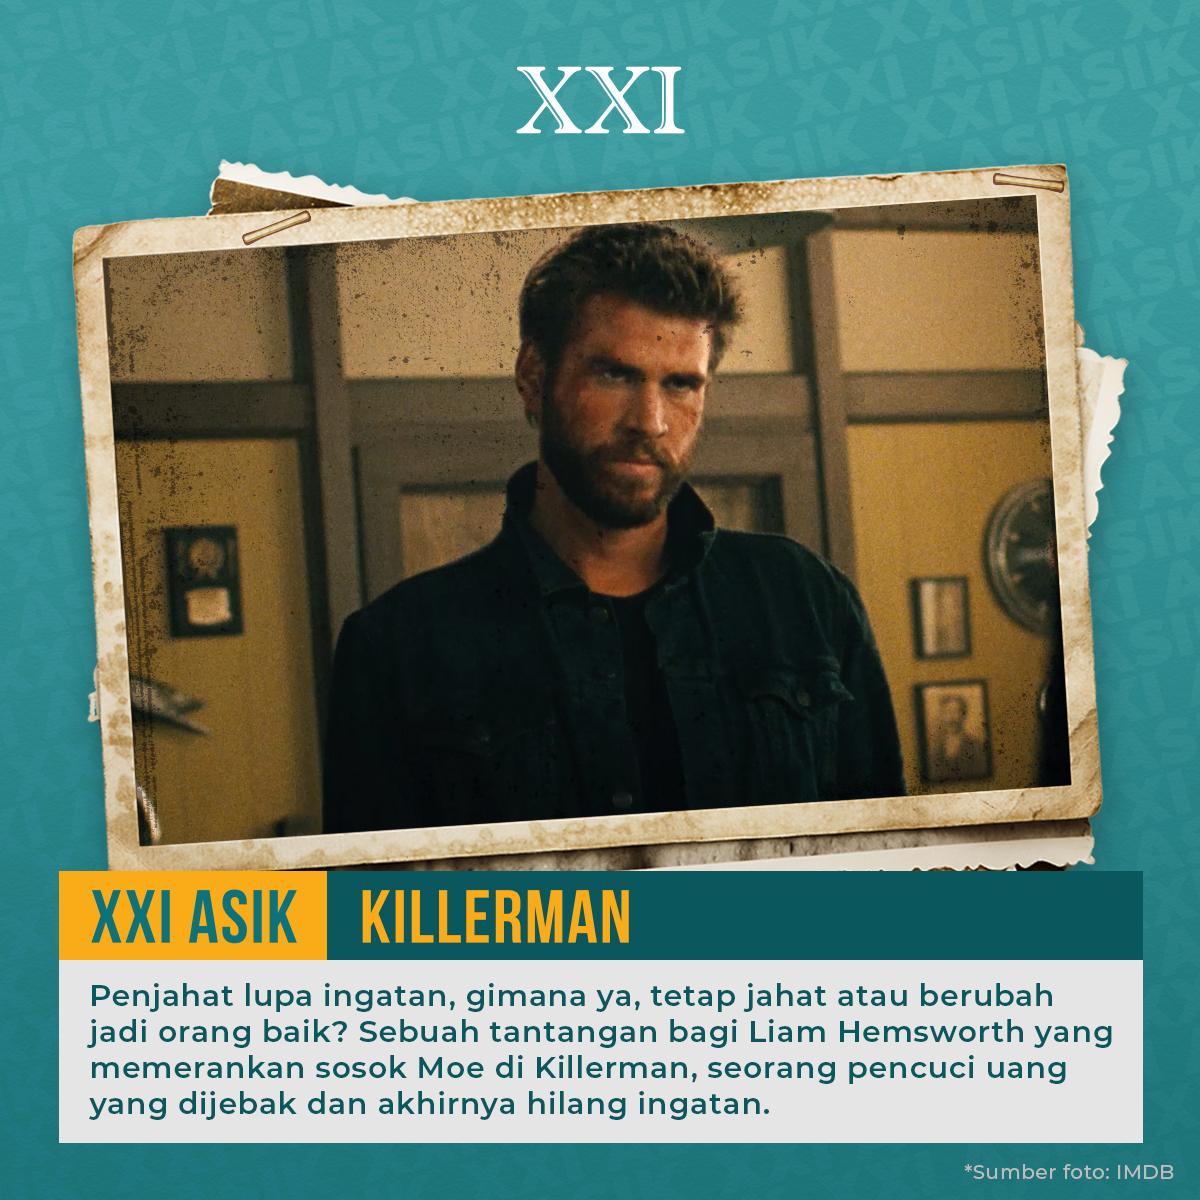 Apa jadinya kalau seorang penjahat lupa ingatan. Berubah baik atau tetap jahat ya?  Temukan jawabannya dalam film Killerman yang dibintangi oleh Liam Hemsworth. Cek  untuk info dan jadwal lengkapnya 😊